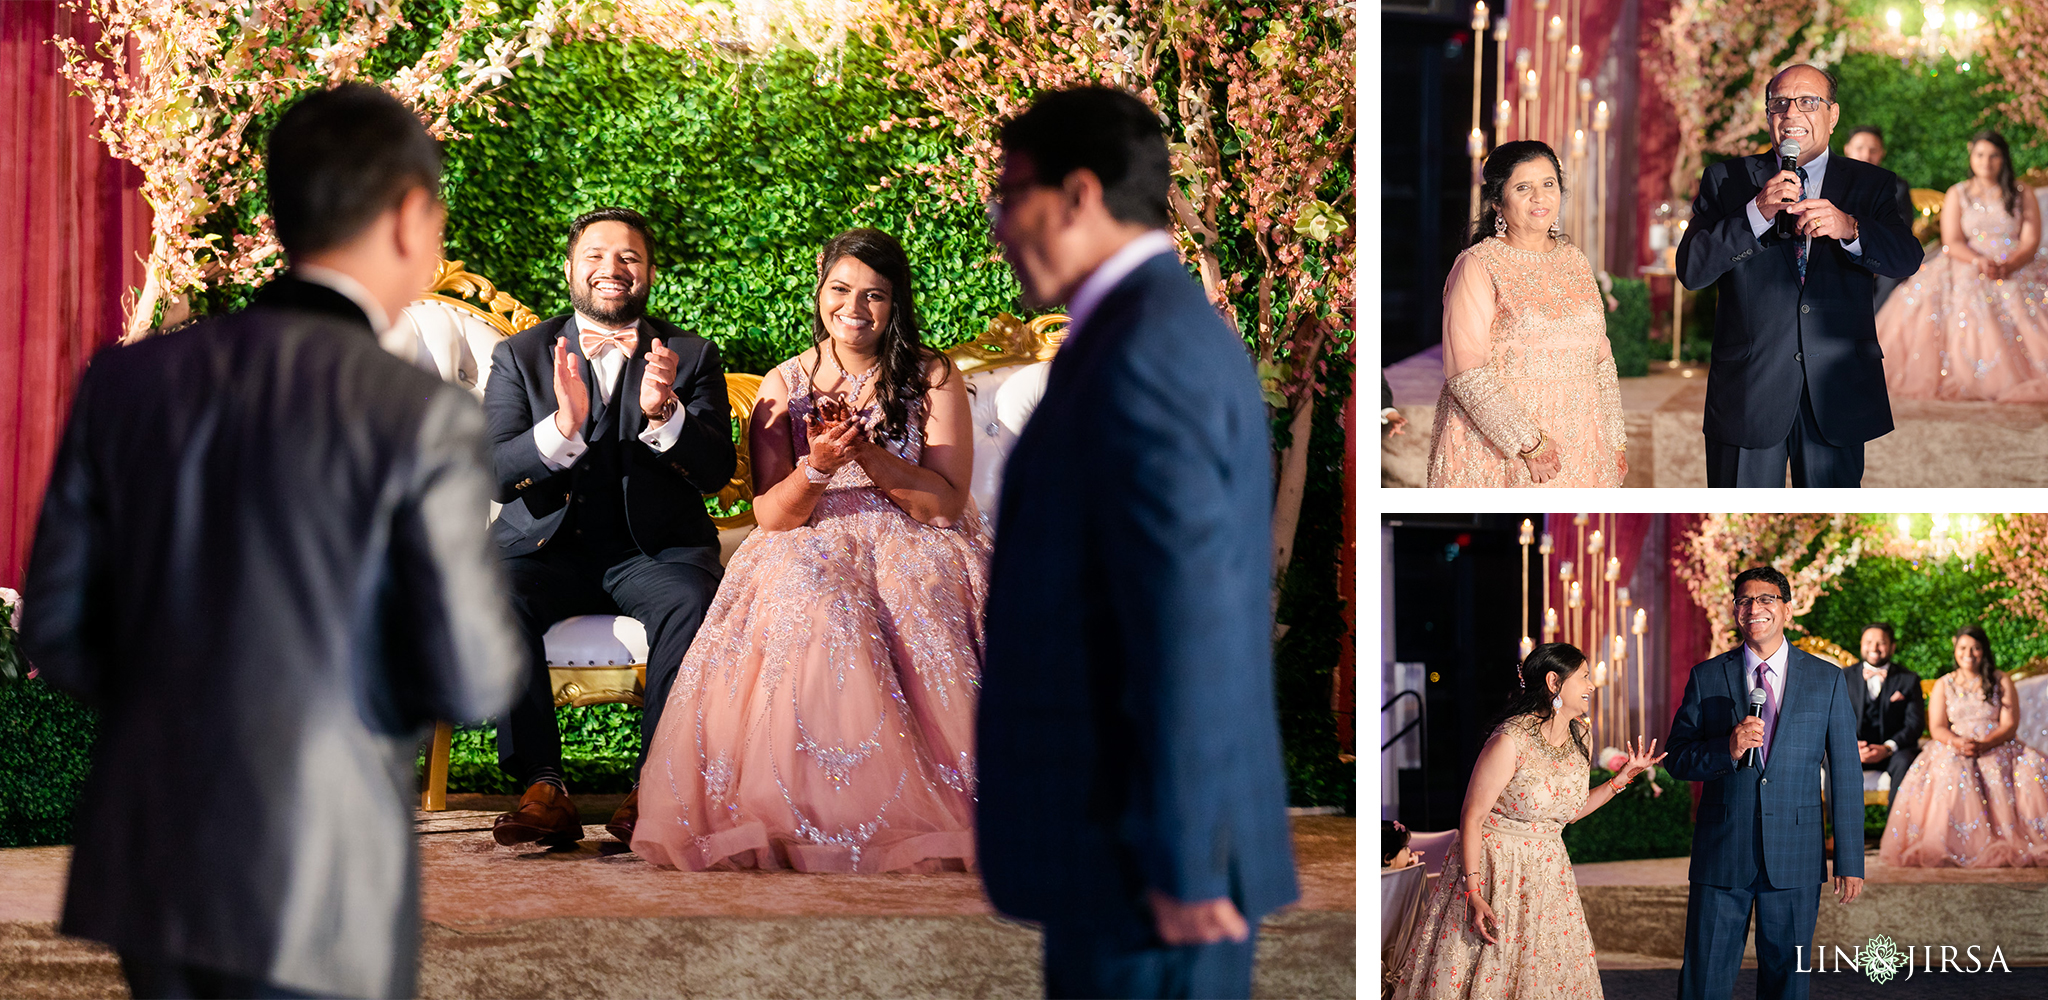 44 Delta Hotels Chesapeake Norfolk Virginia Indian Wedding Photography